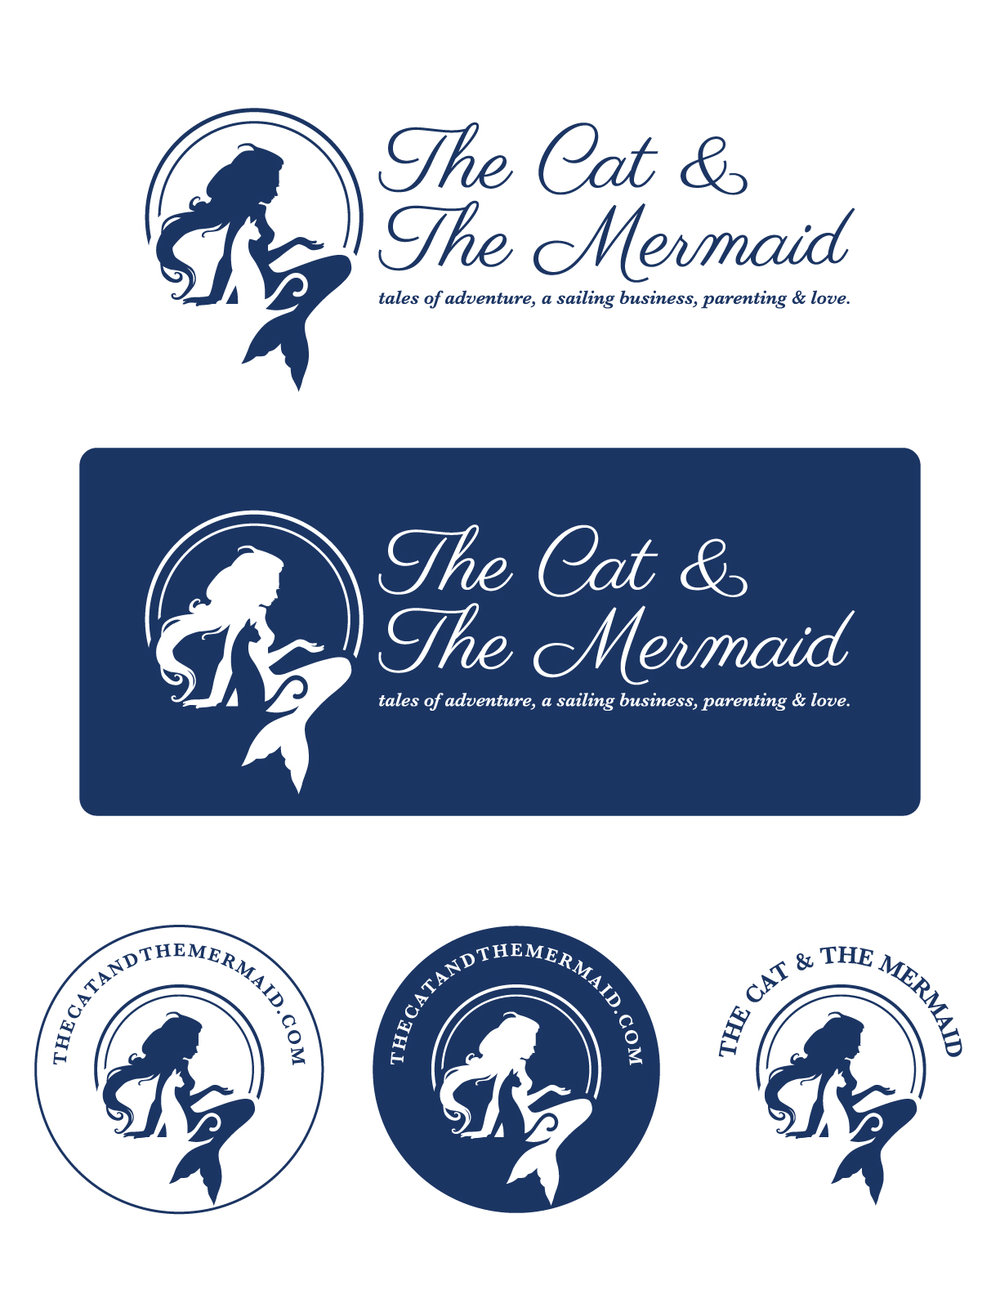 The-Cat-&-The-Mermaid_AllFiles.jpg